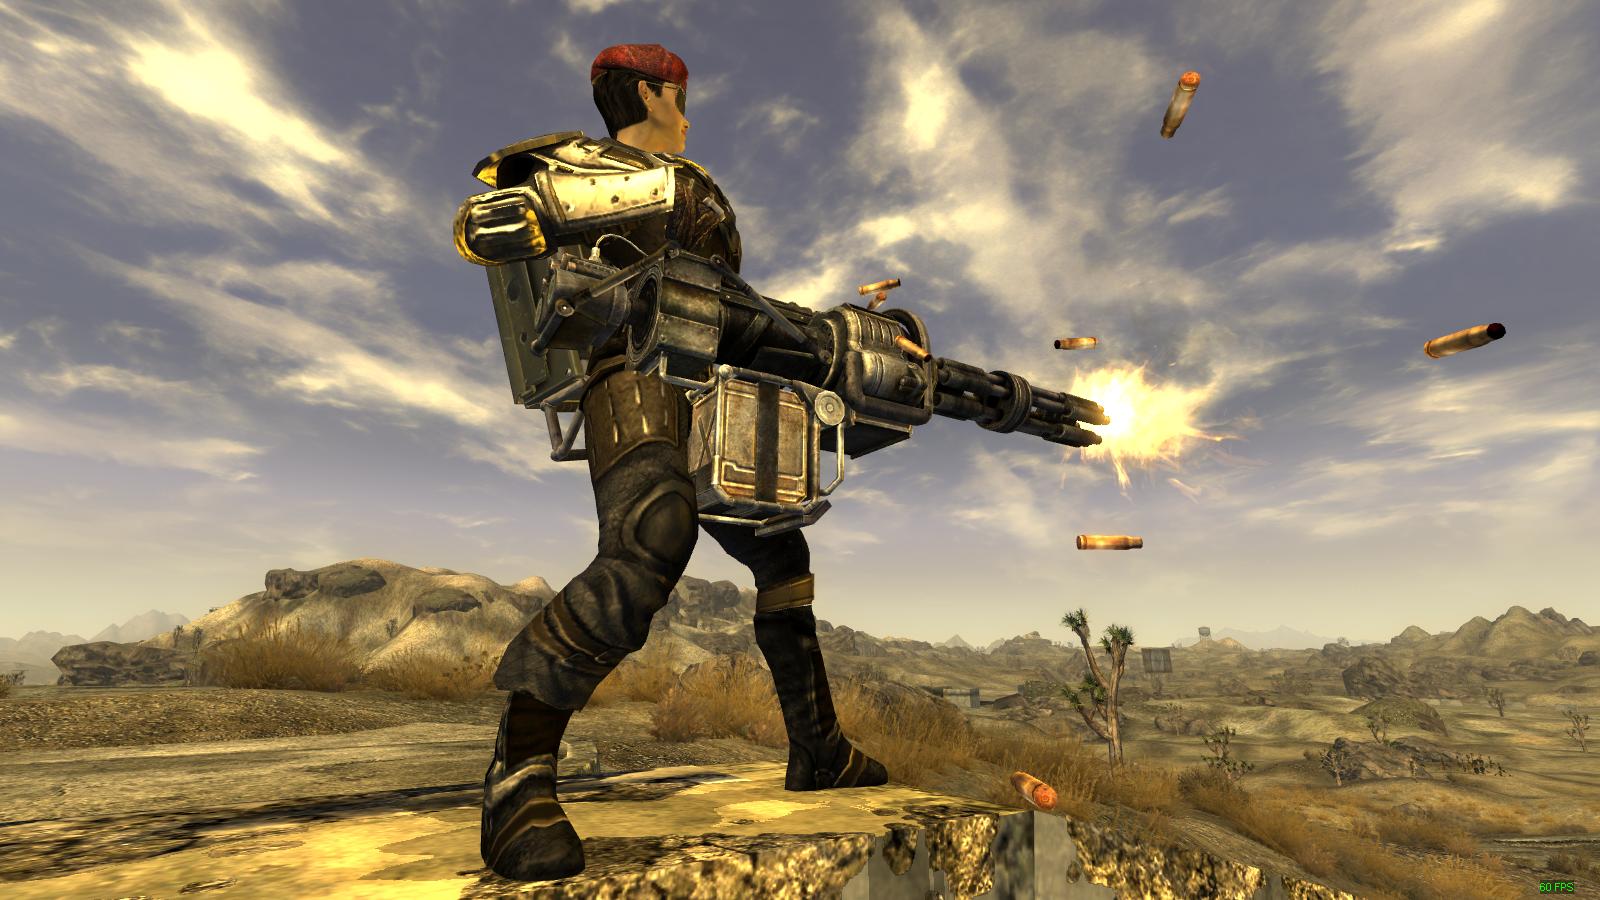 Minigun Long Wind Up Spin Up Restoration At Fallout New Vegas Mods And Community Fallout New Vegas Mod Restoration